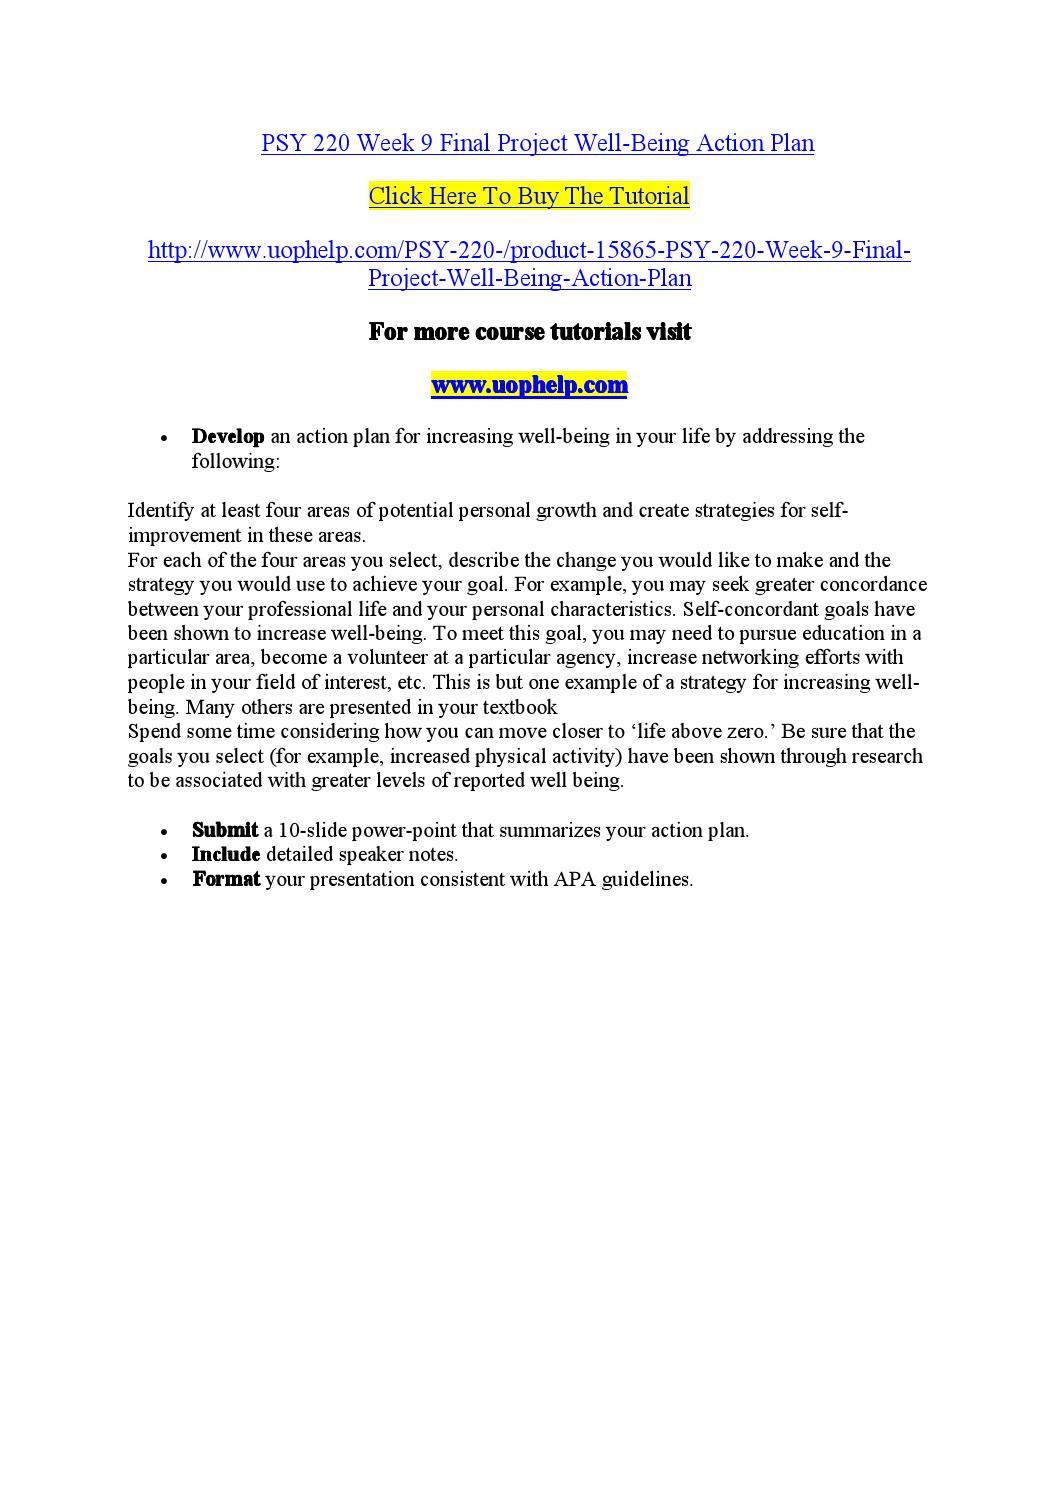 XACC 280 UOP COURSE/UOPHELP